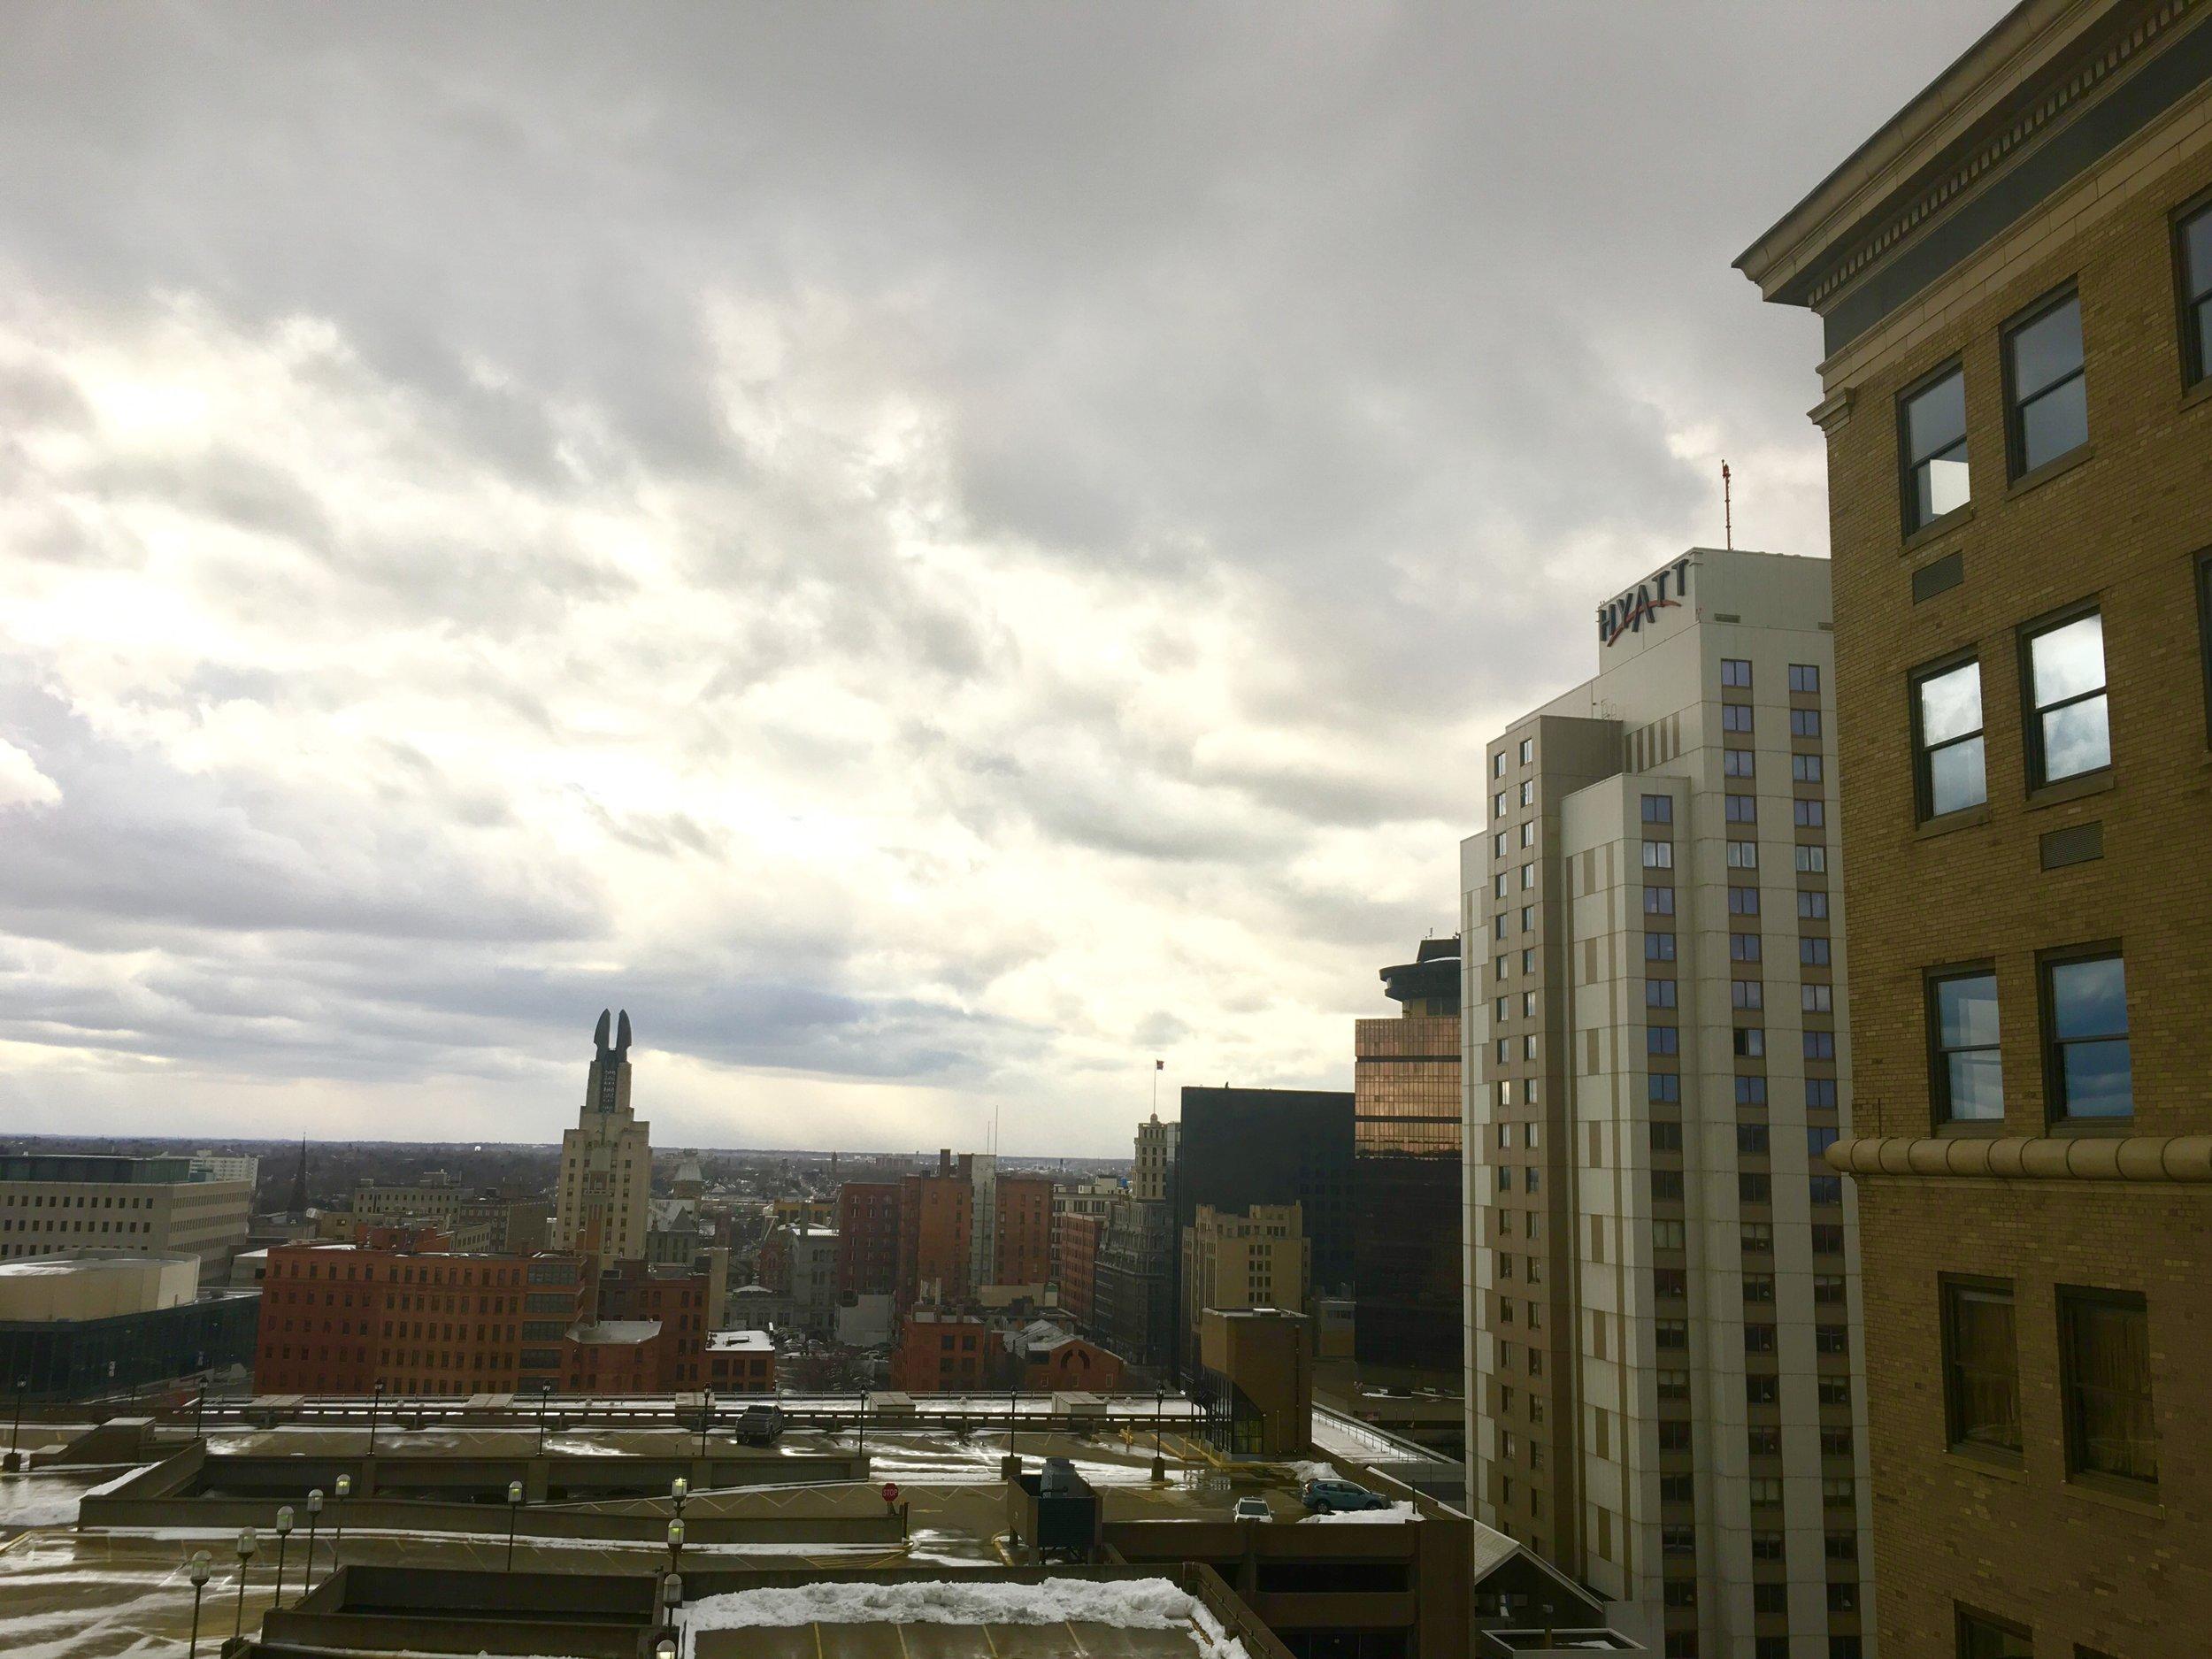 City of Rochester skyline